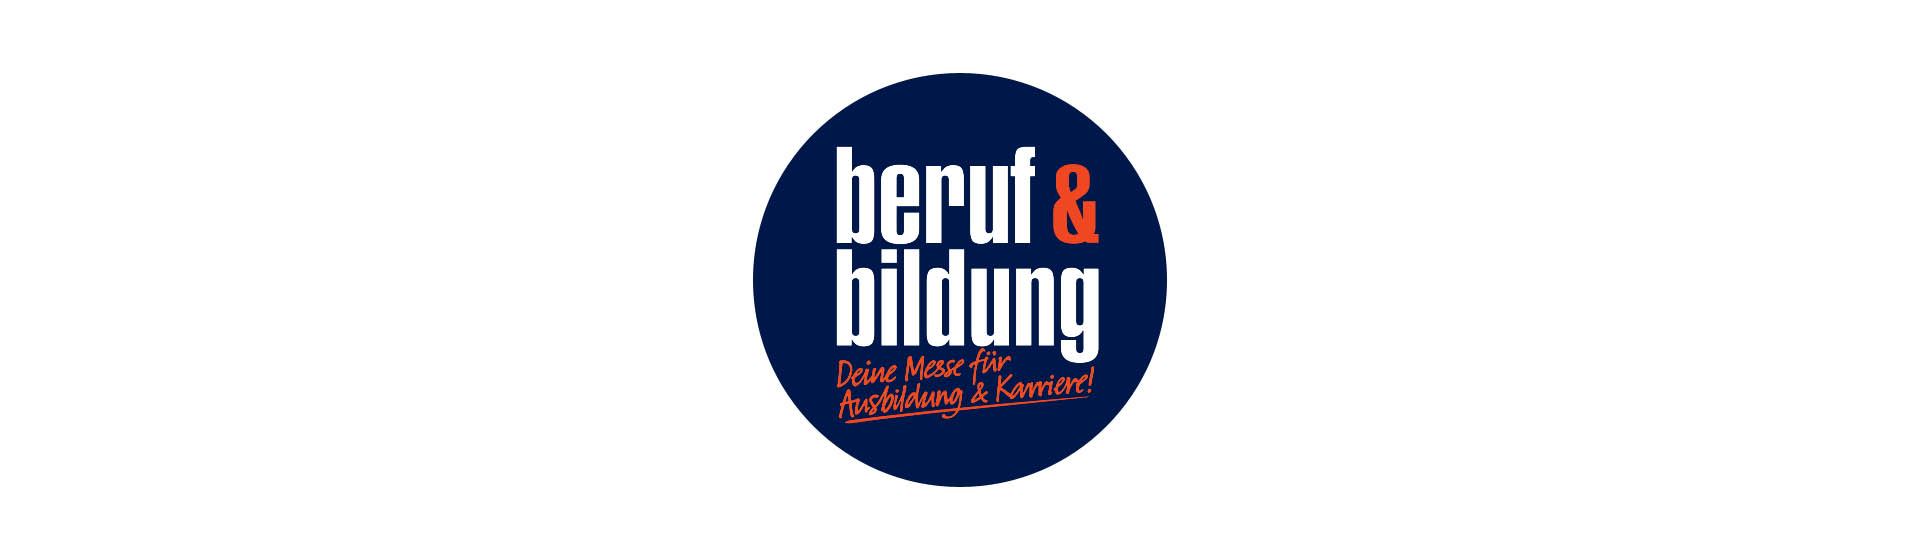 Logo beruf & bildung Hannover